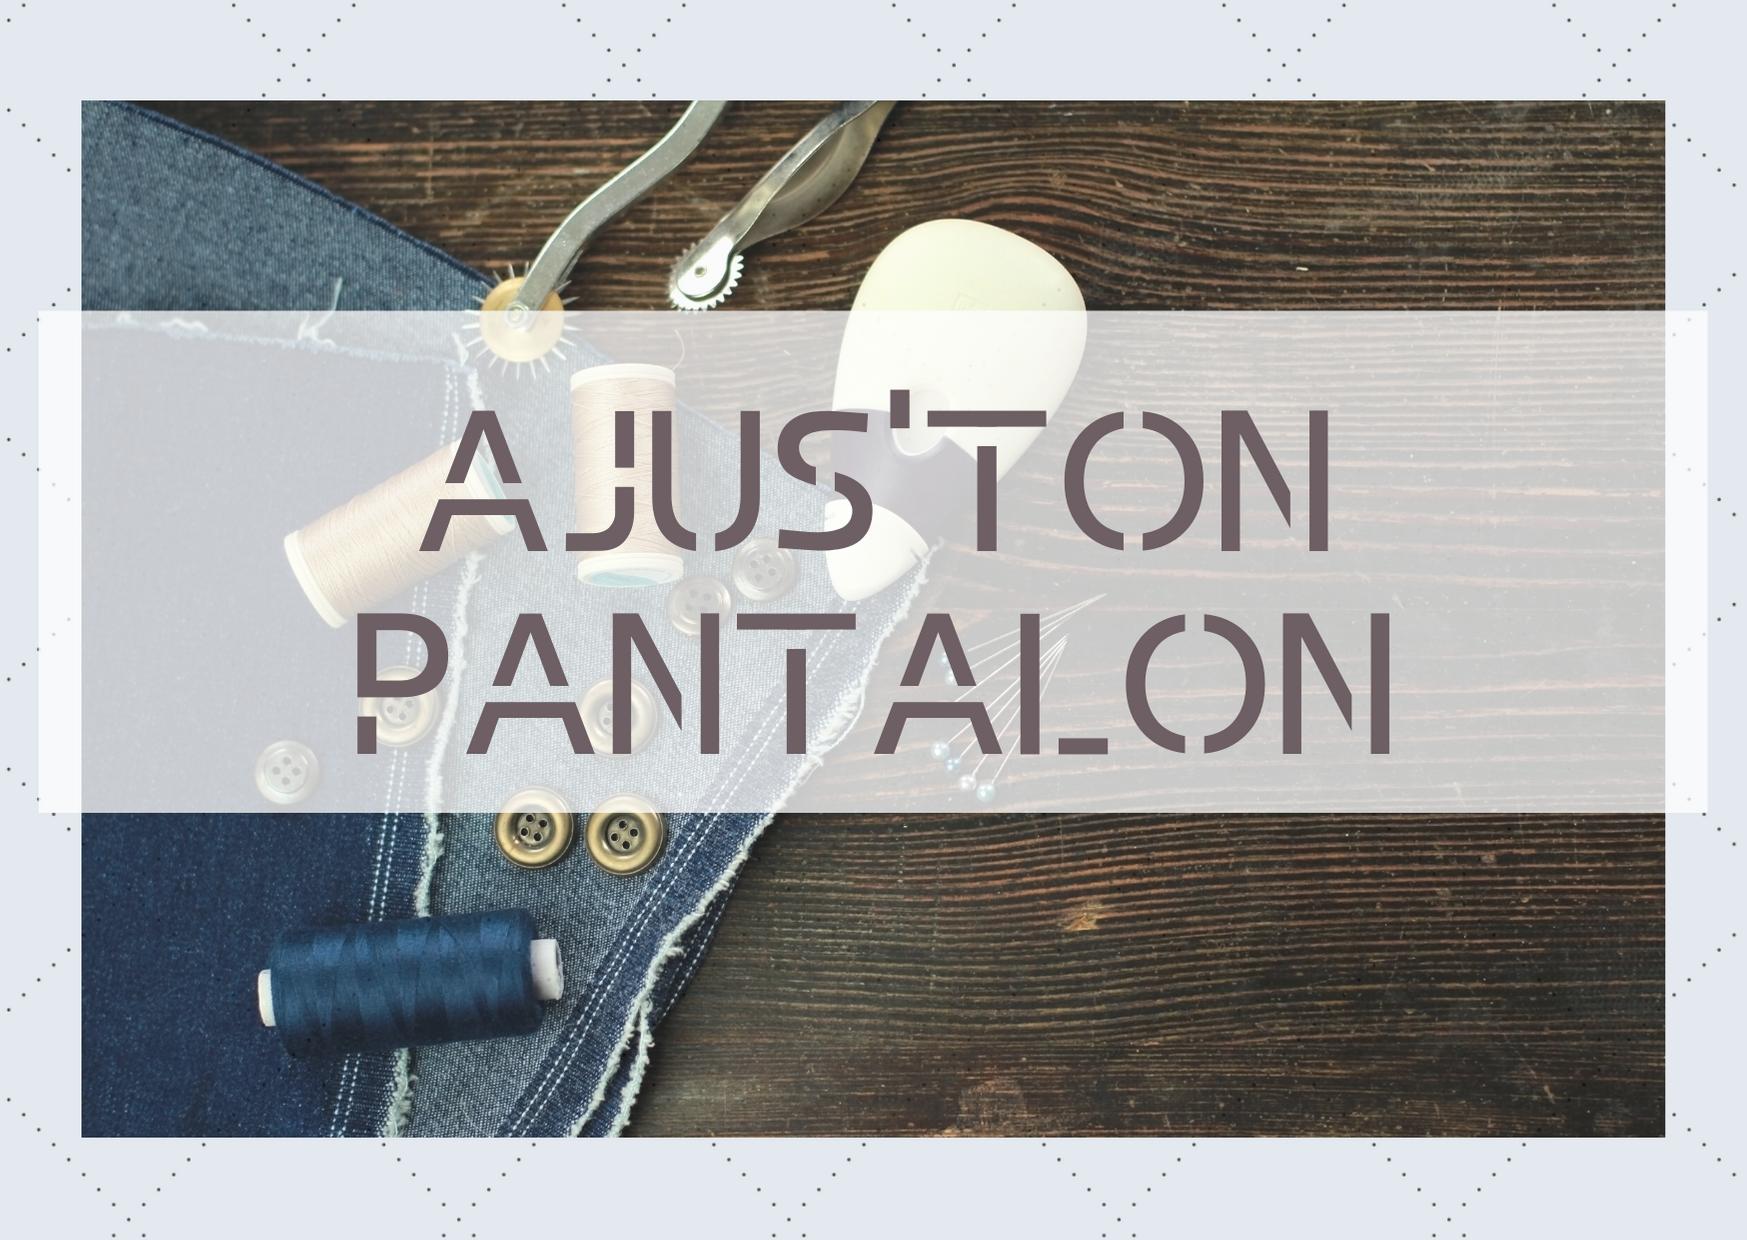 AJUS'TON'PANTALON